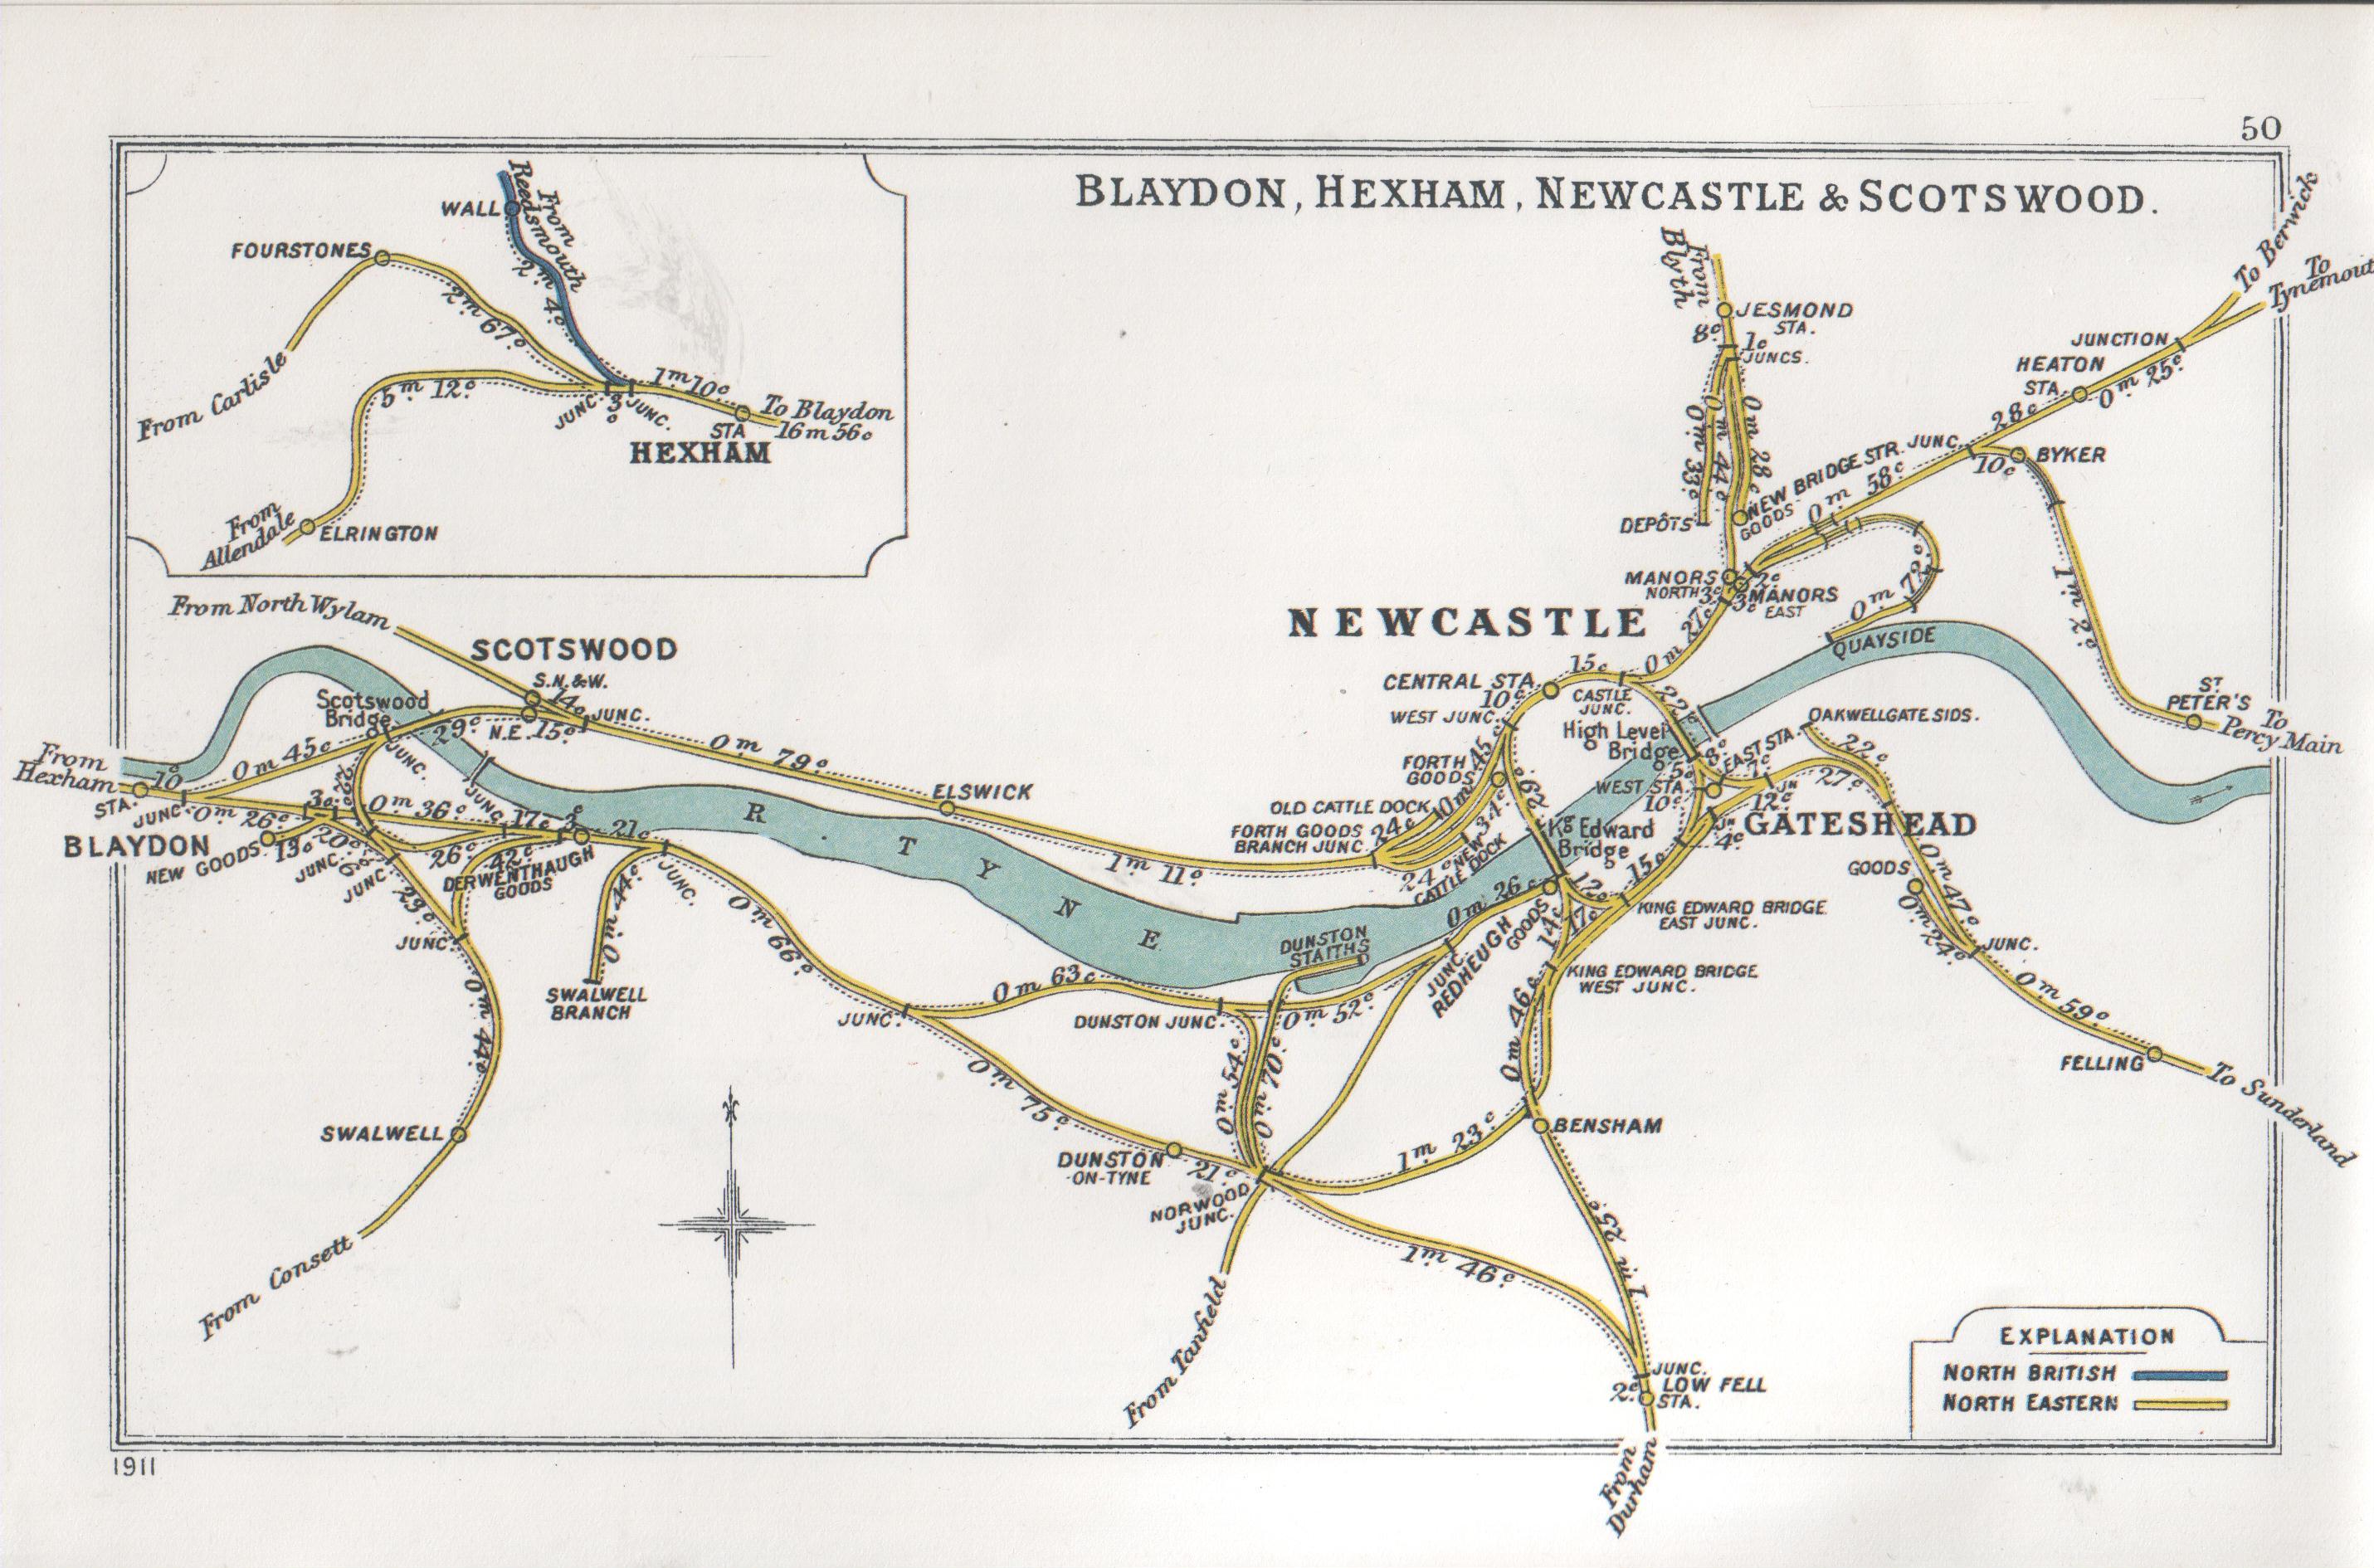 Lner Encyclopedia  The North Eastern Railway  Bridges Around Newcastle